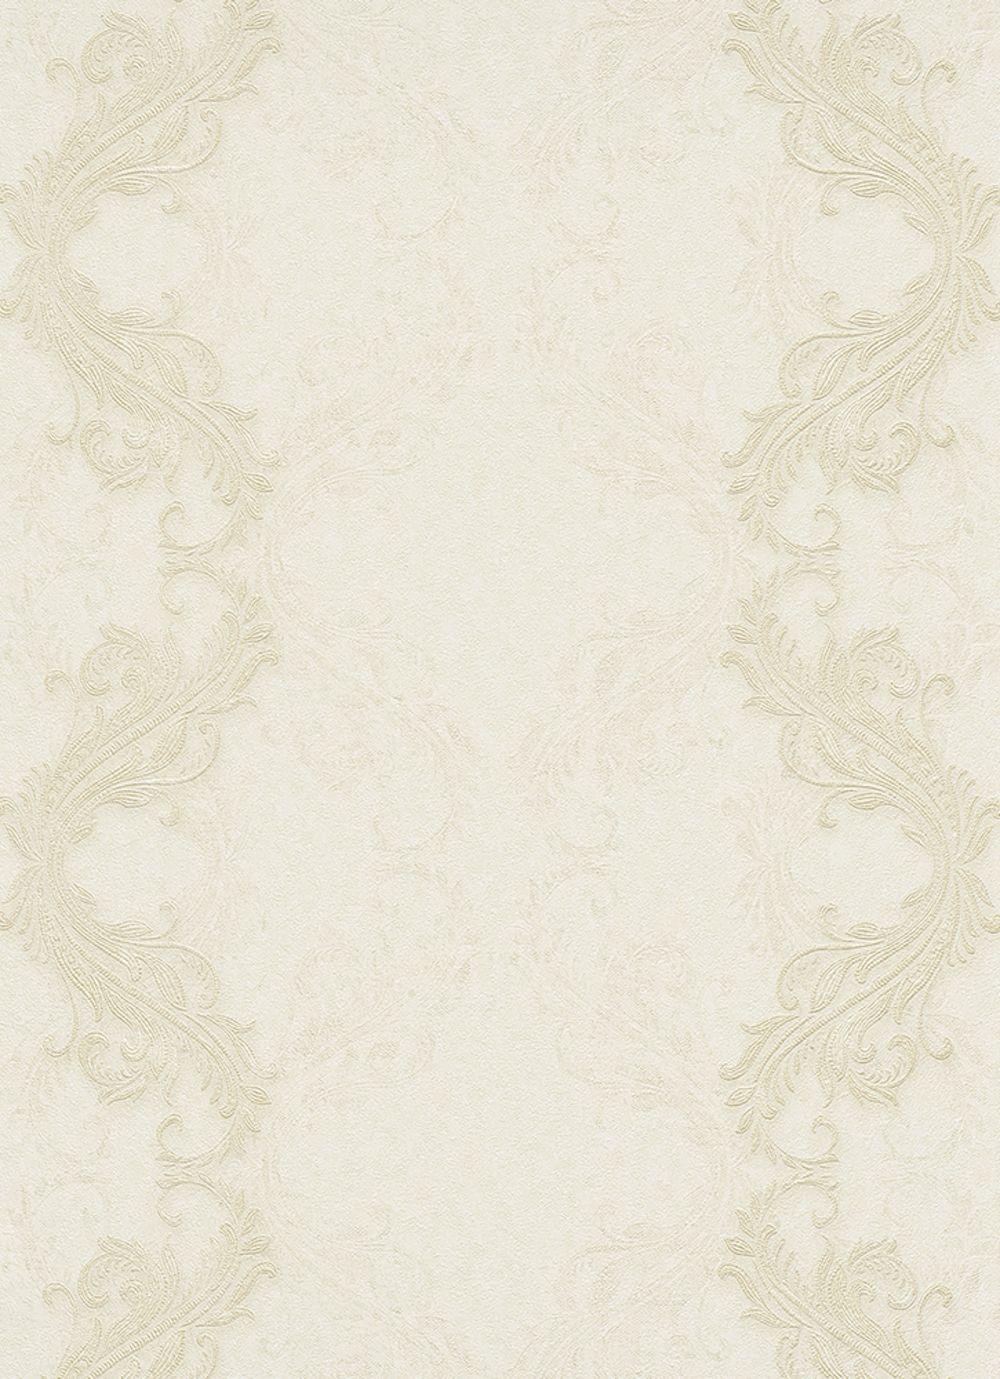 Erismann Eterna Wallpaper Roll   20 in   Cream/Beige in 2020 ...